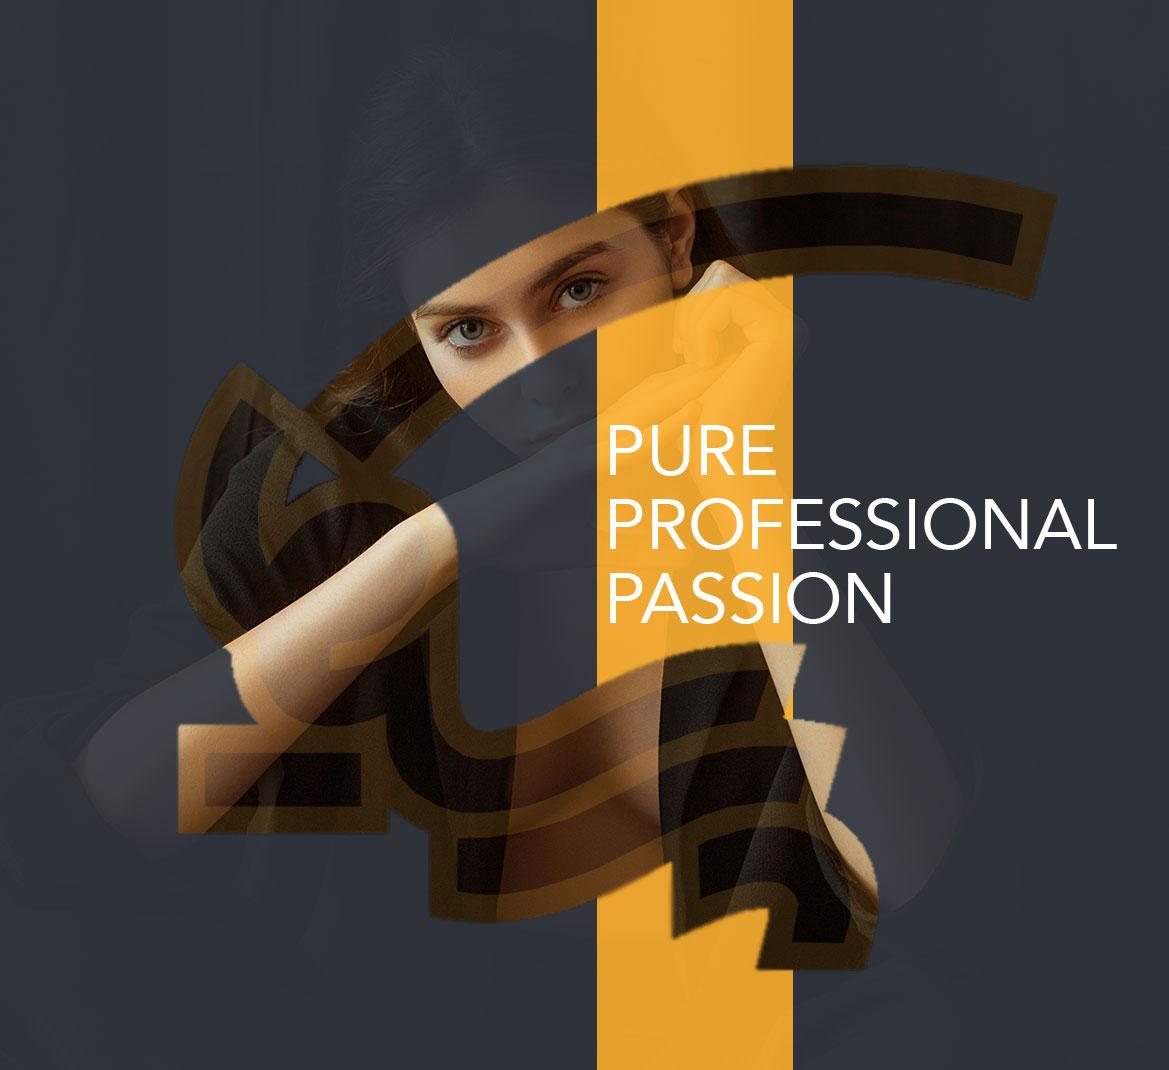 pure professional passion